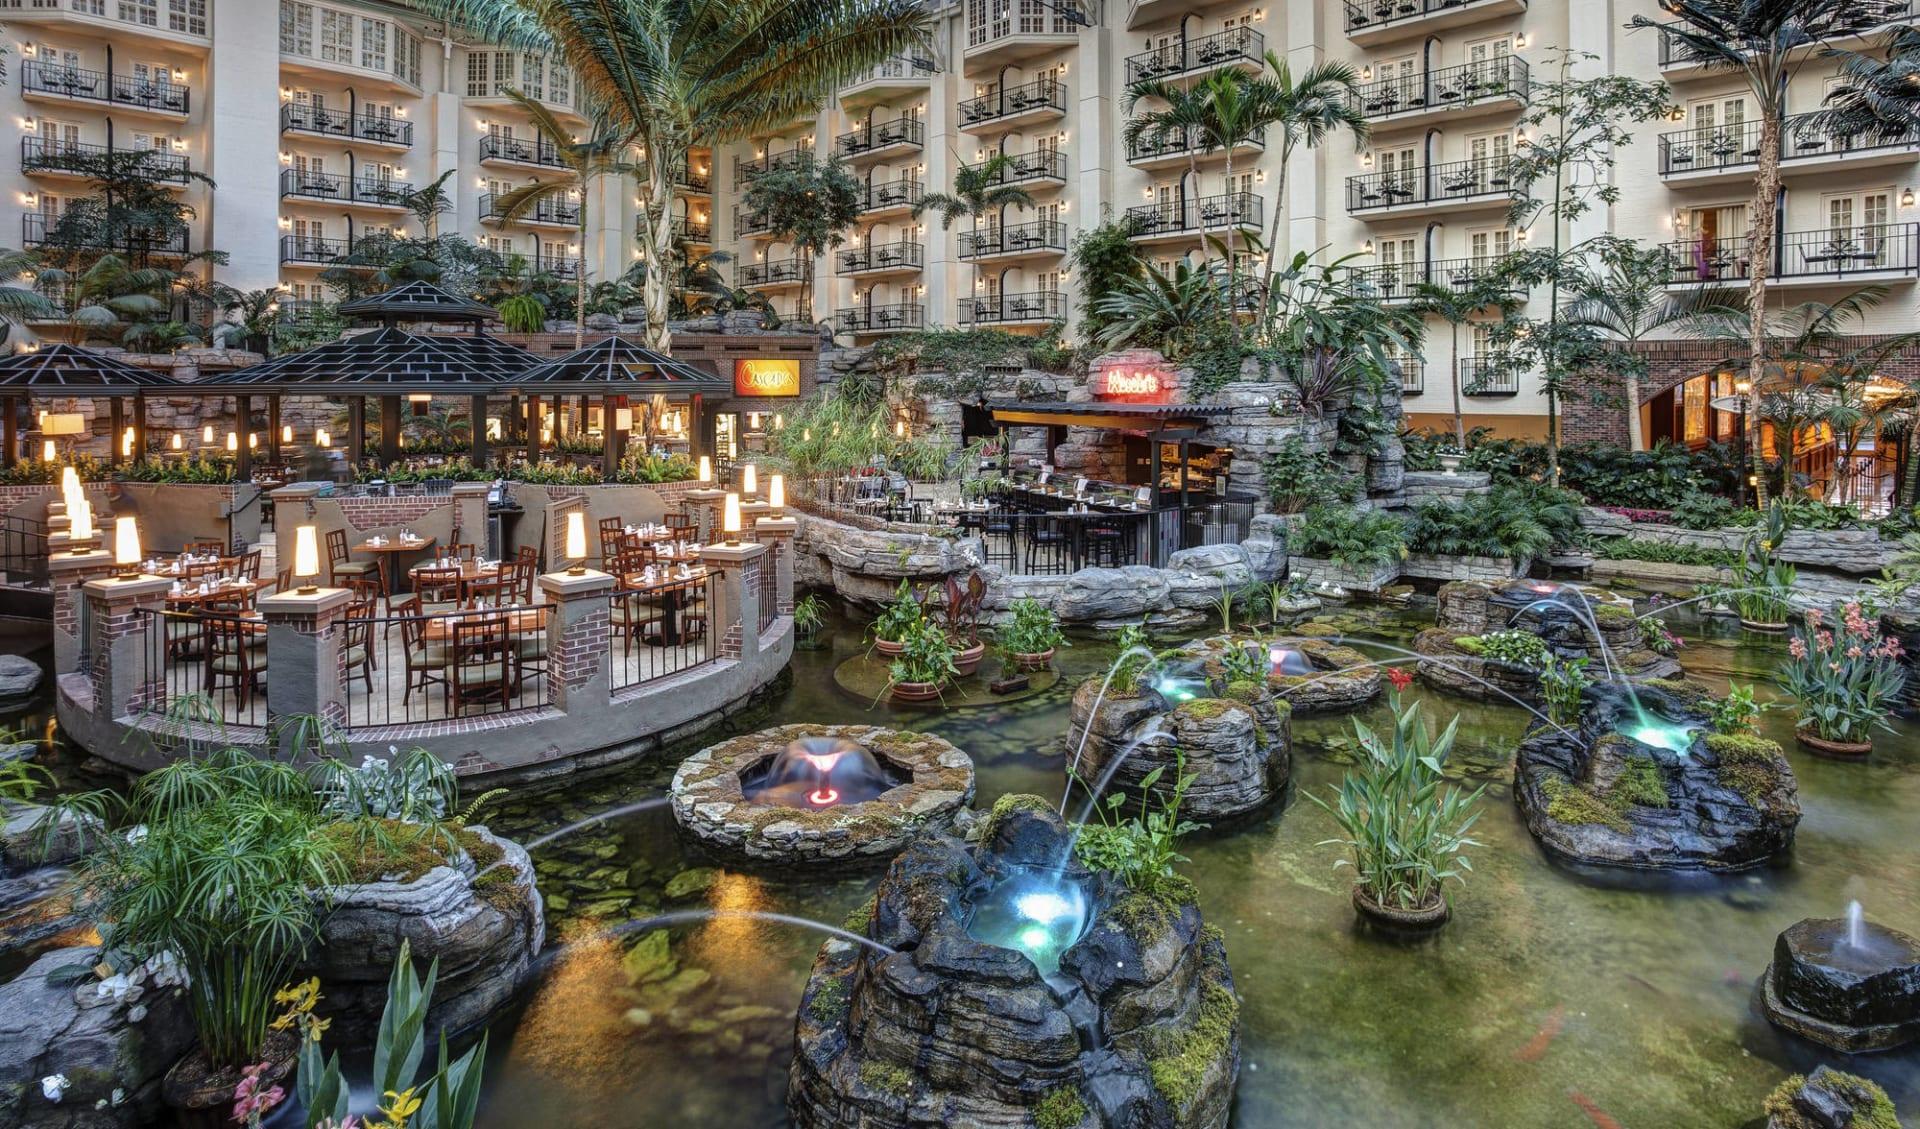 Gaylord Opryland Resort in Nashville:  Gaylord Opryland - Cascades Atrium